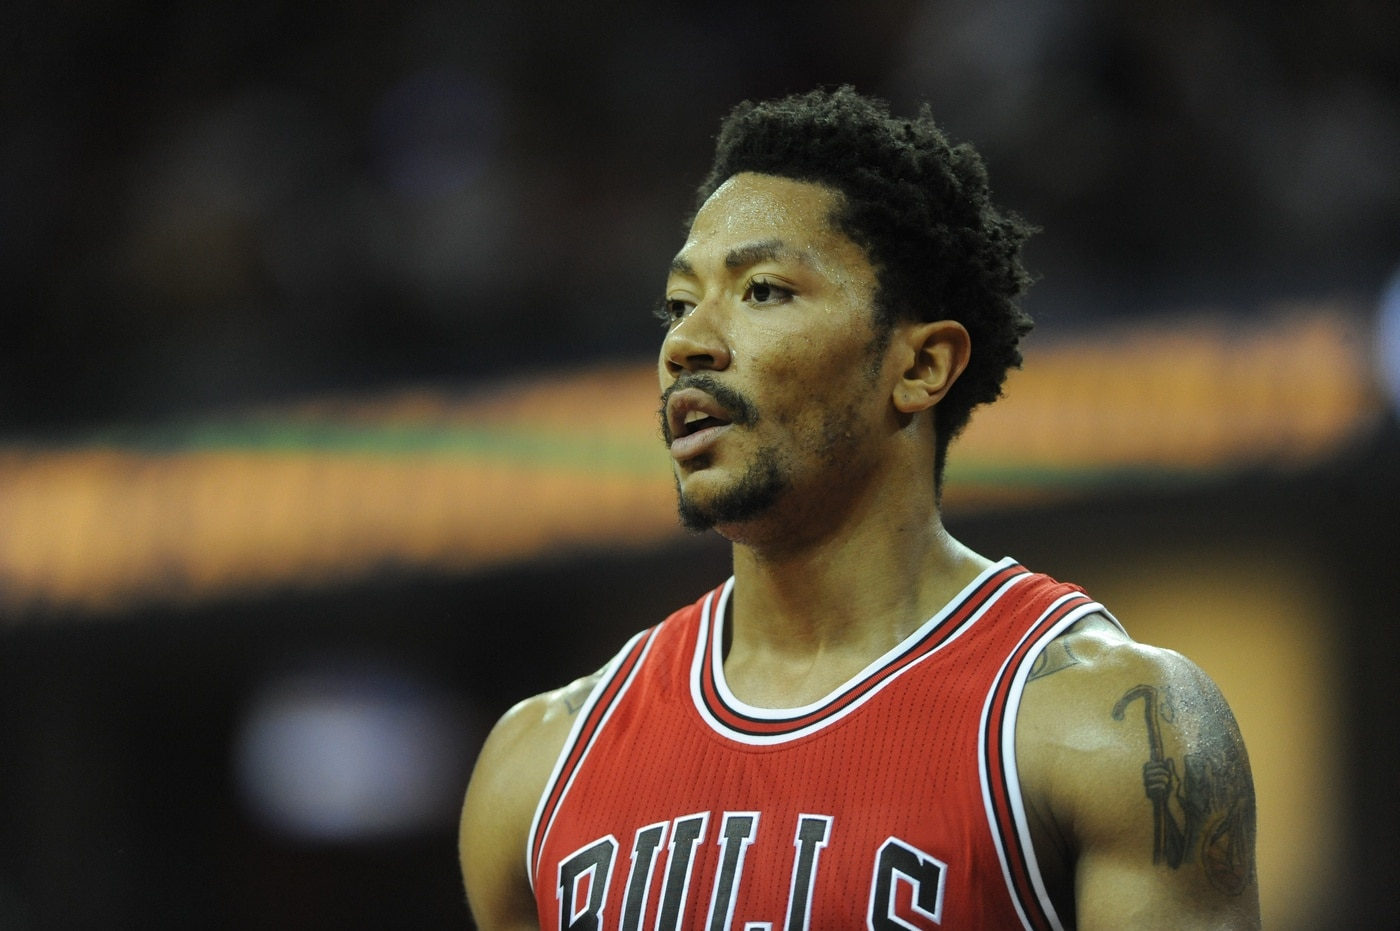 766e4cffe54 Bulls point guard Derrick Rose   I know I m great